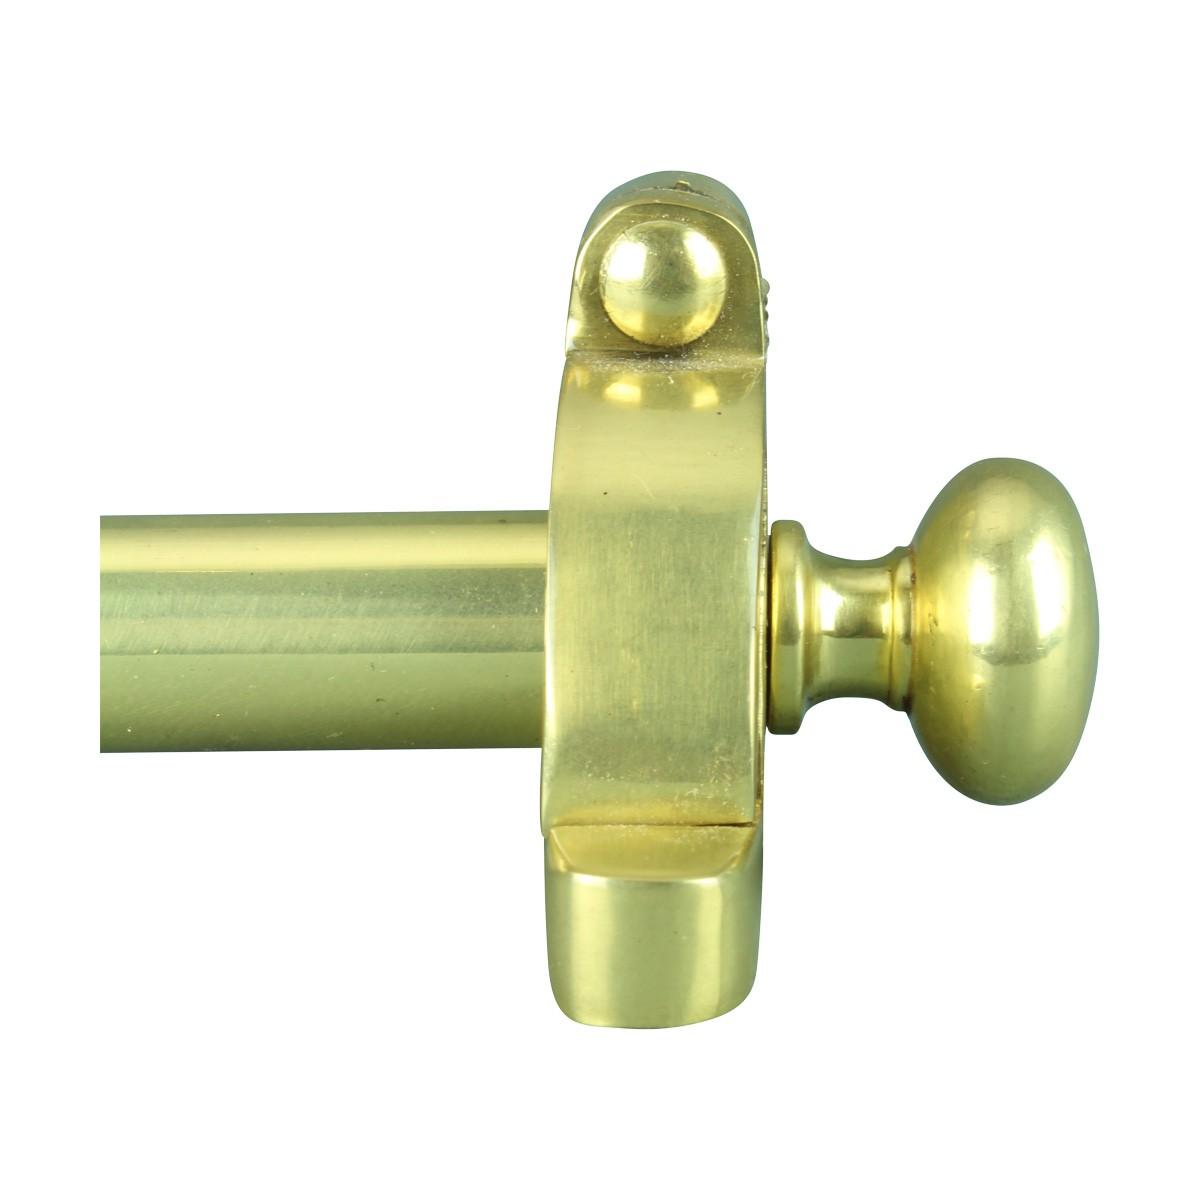 Ball Tip Stair Carpet Rod Set Bright Brass 36 Inch L 12 Inch D Carpet Rods for Stairs Carpet Rod Set Brass Bright Brass Stair Carpet Rod